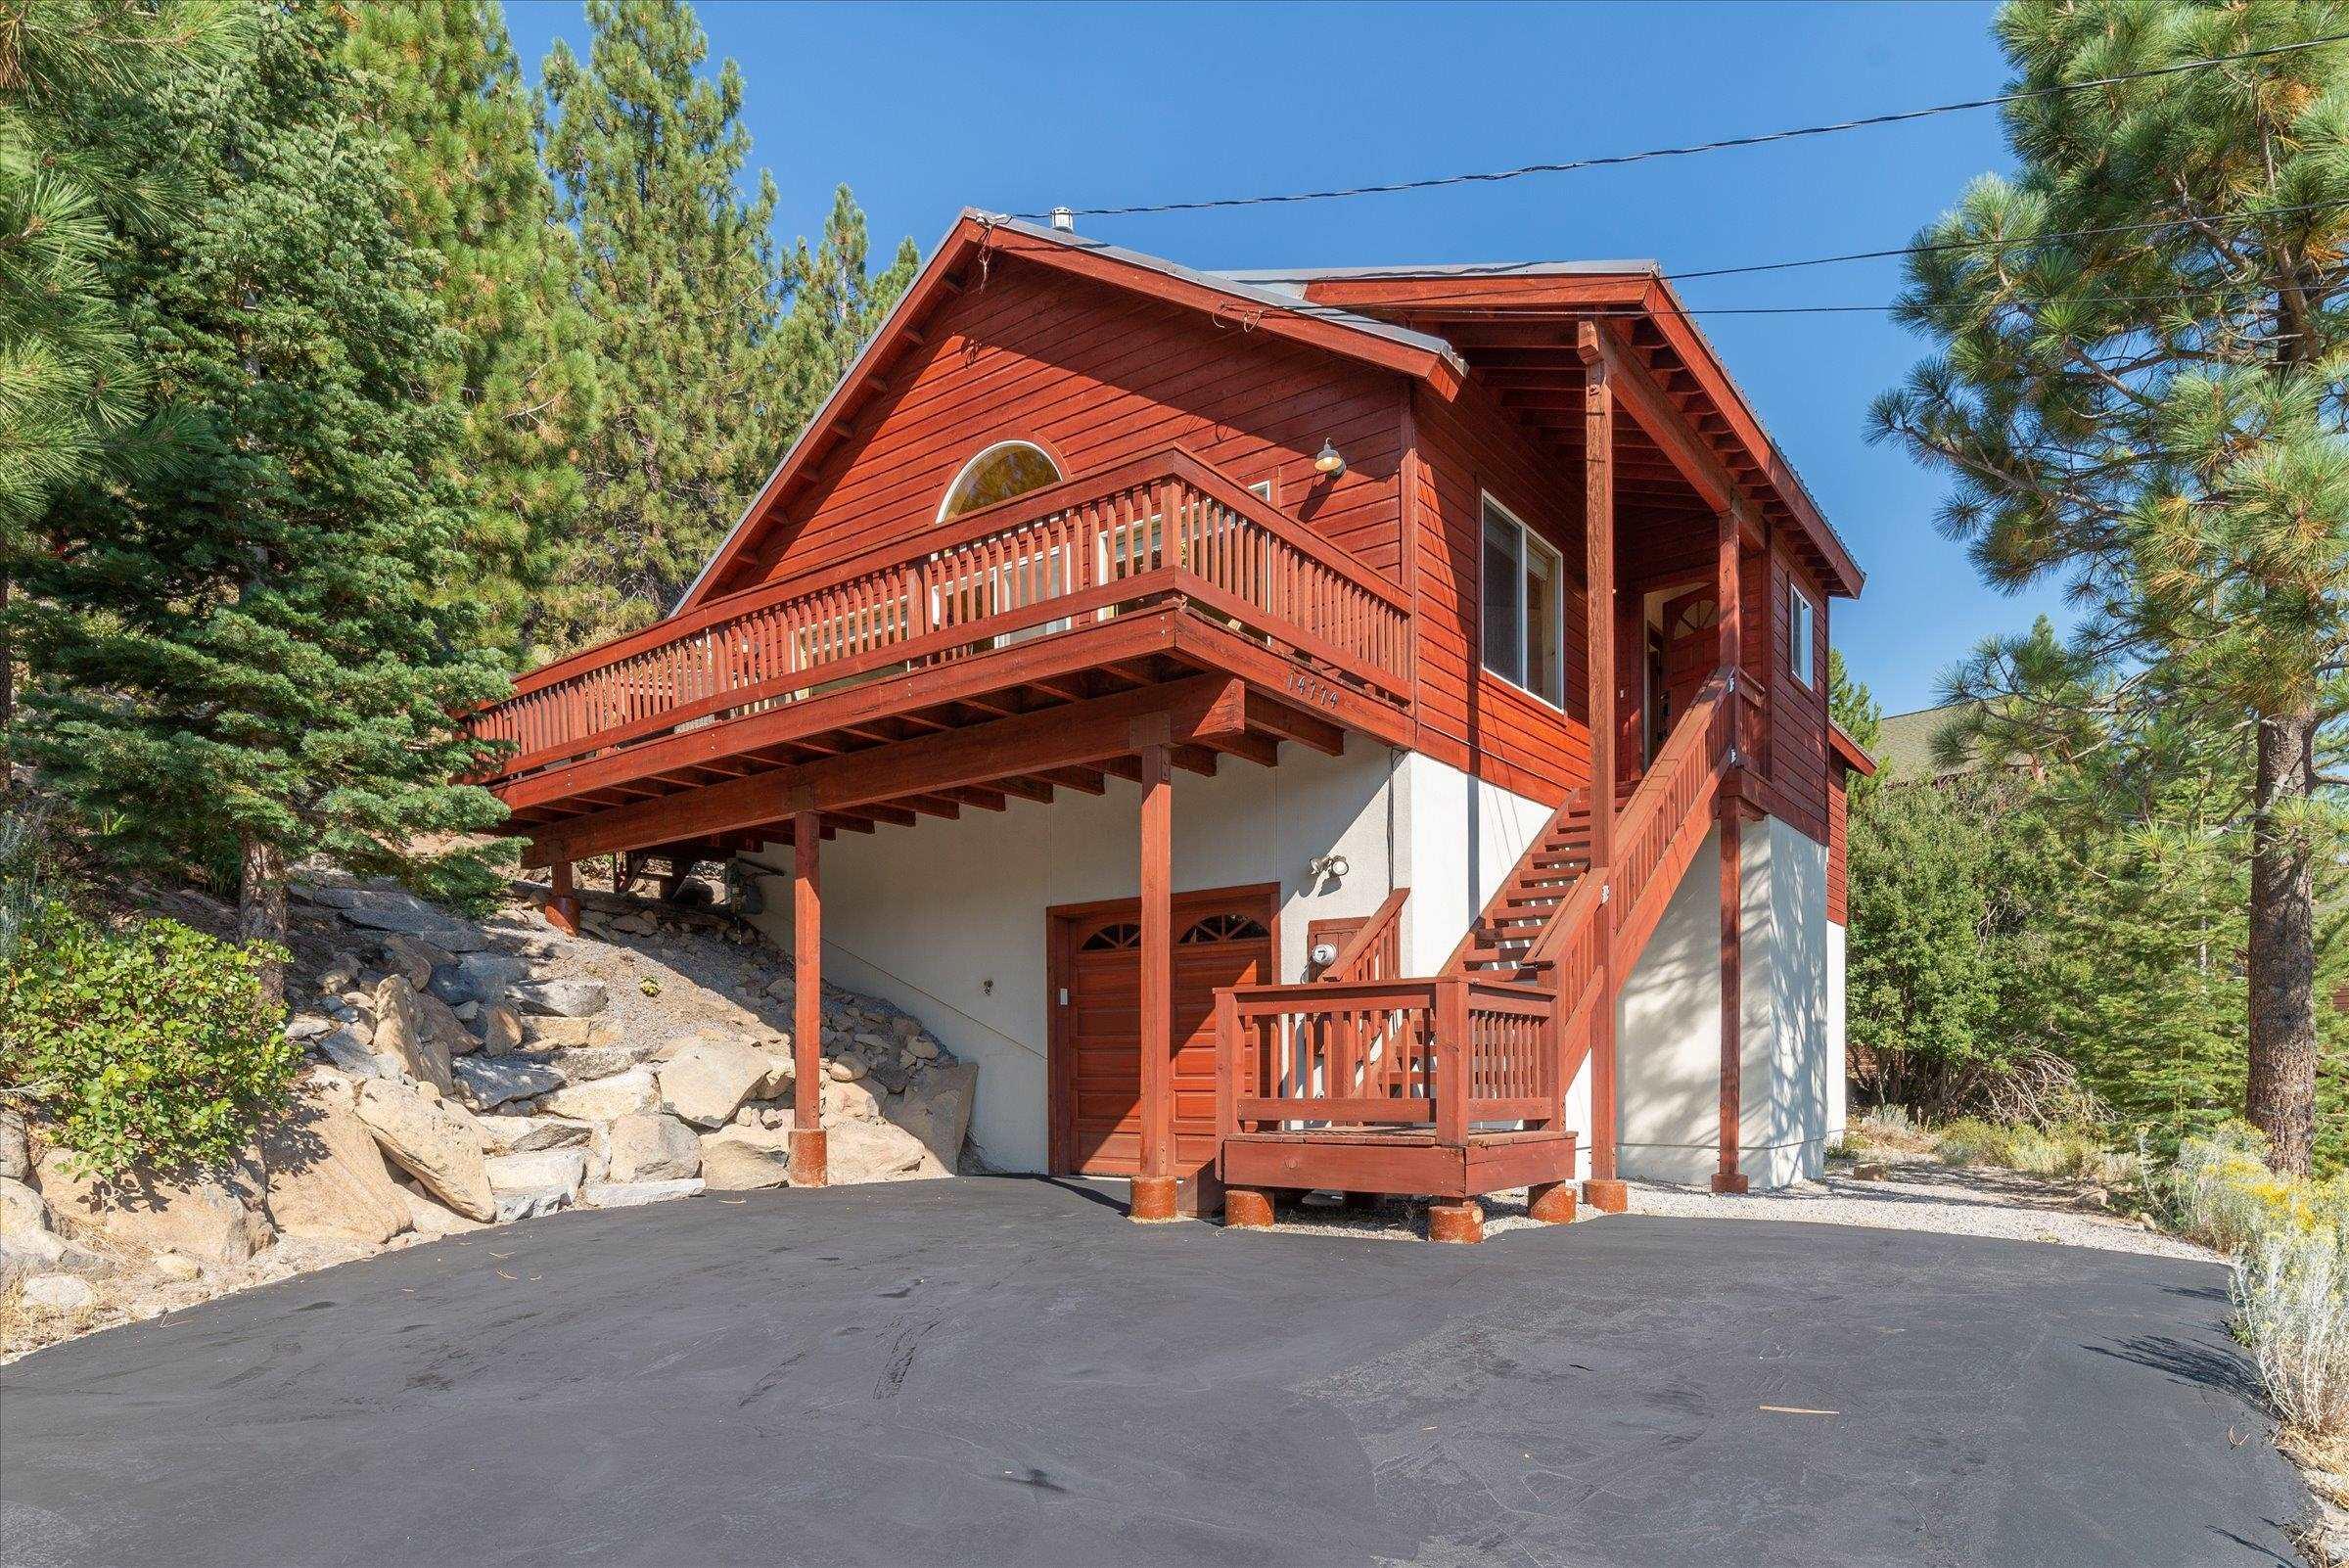 Image for 14774 Alder Creek Road, Truckee, CA 96161